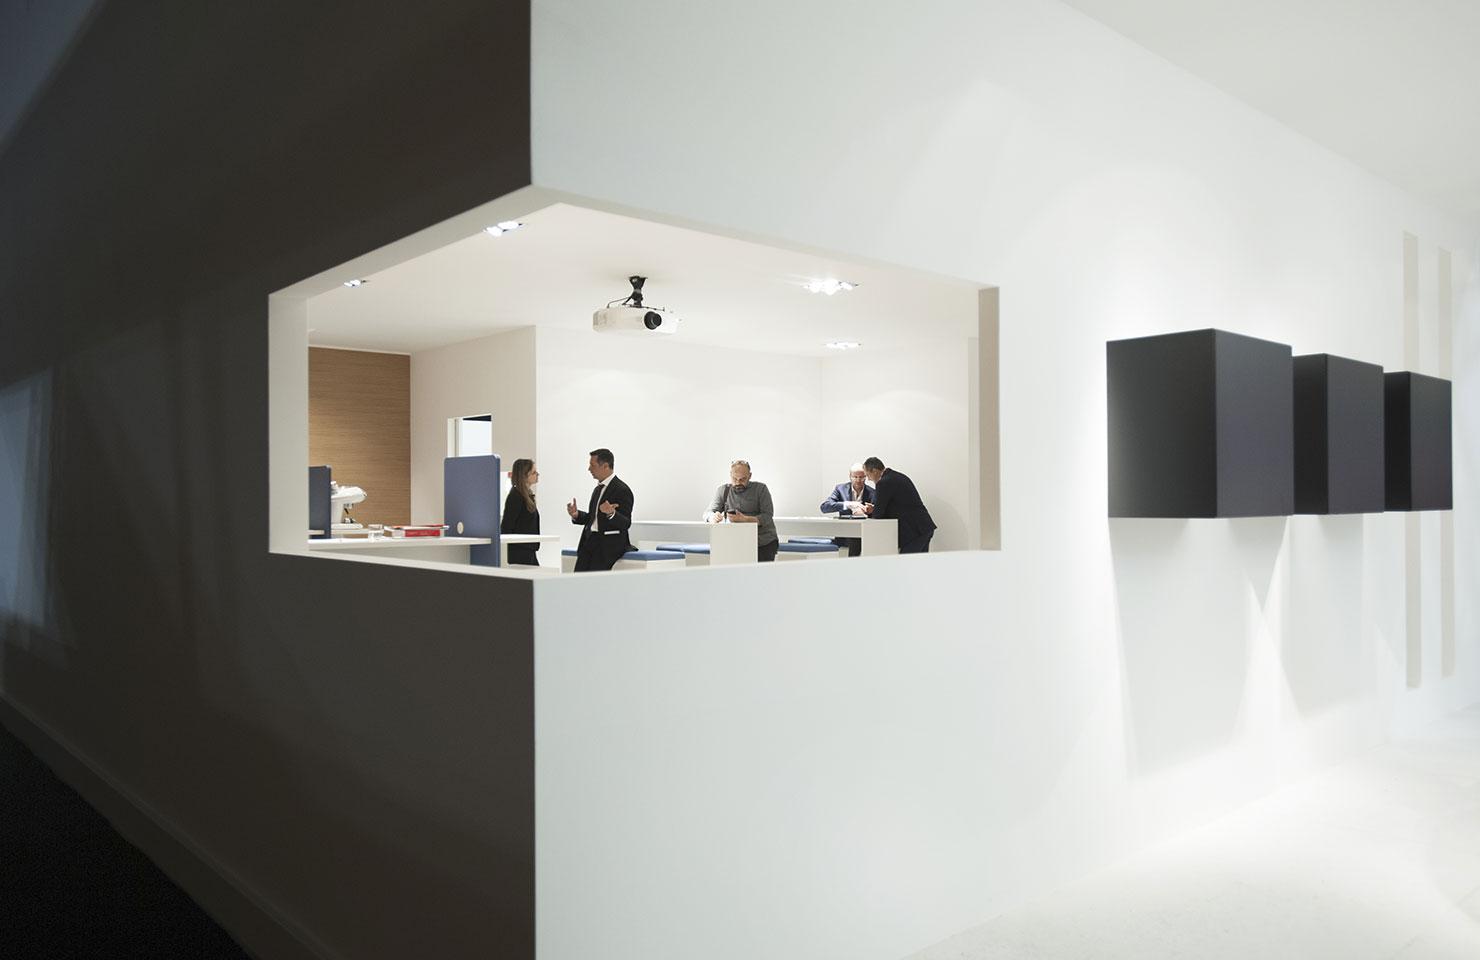 Workplace3.0